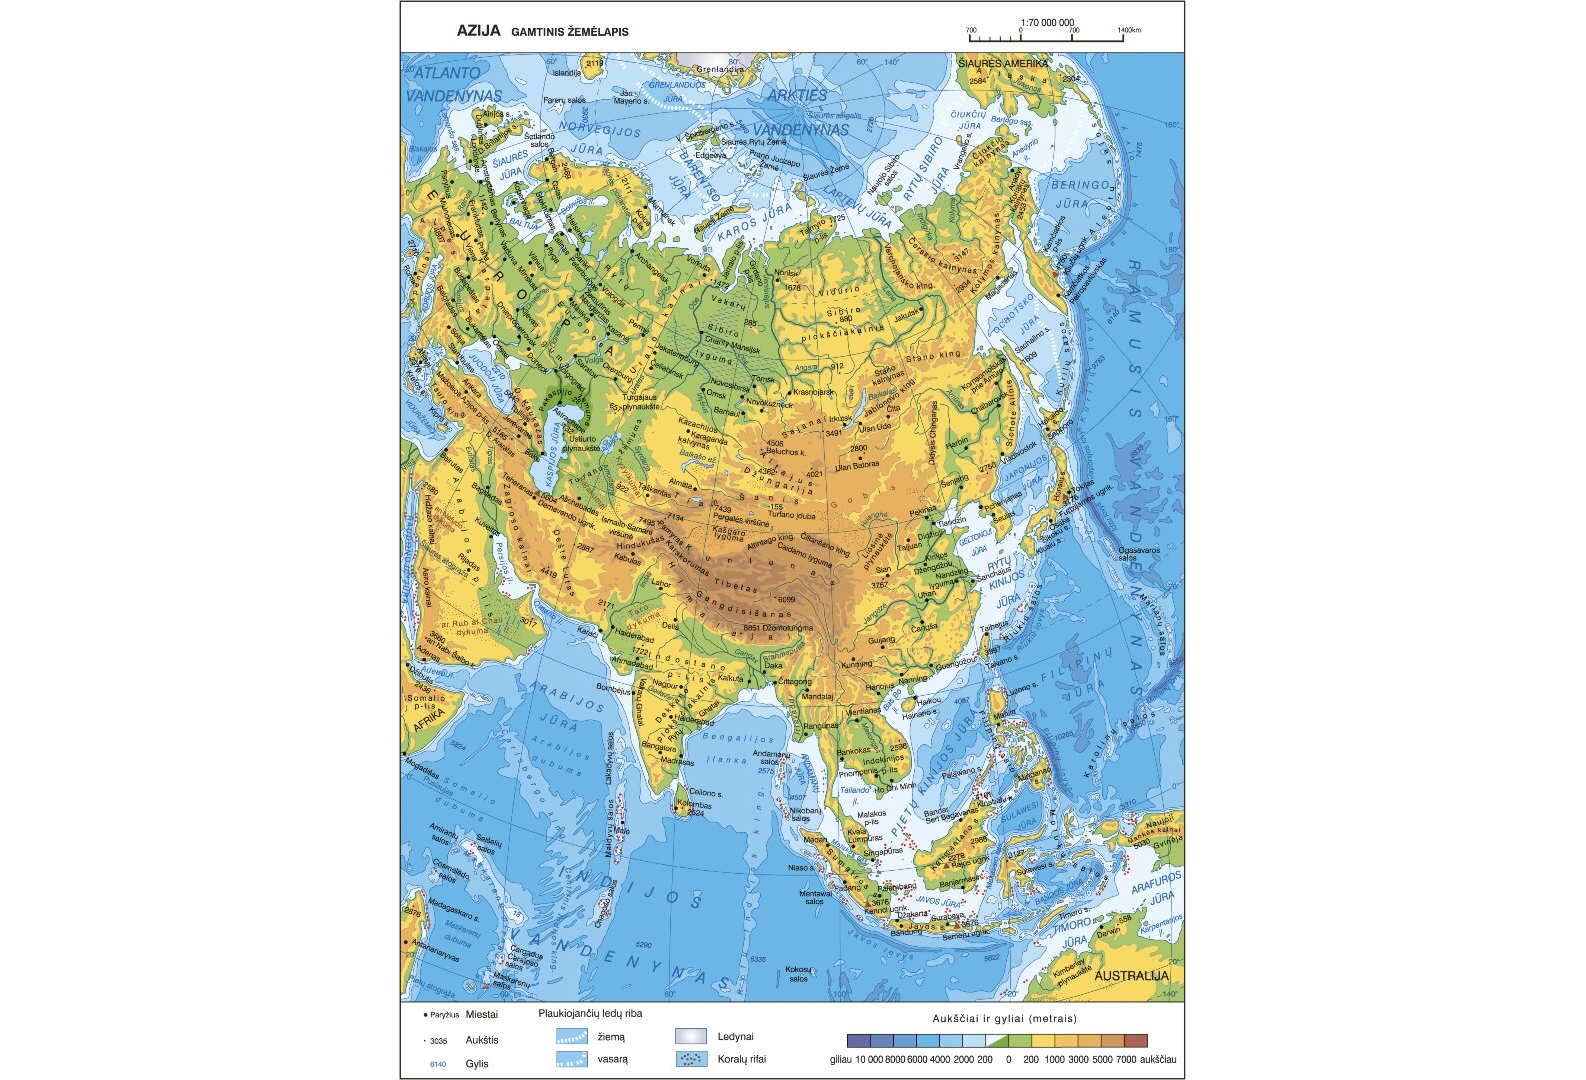 Vidurio dydzio narys Centrineje Azijoje